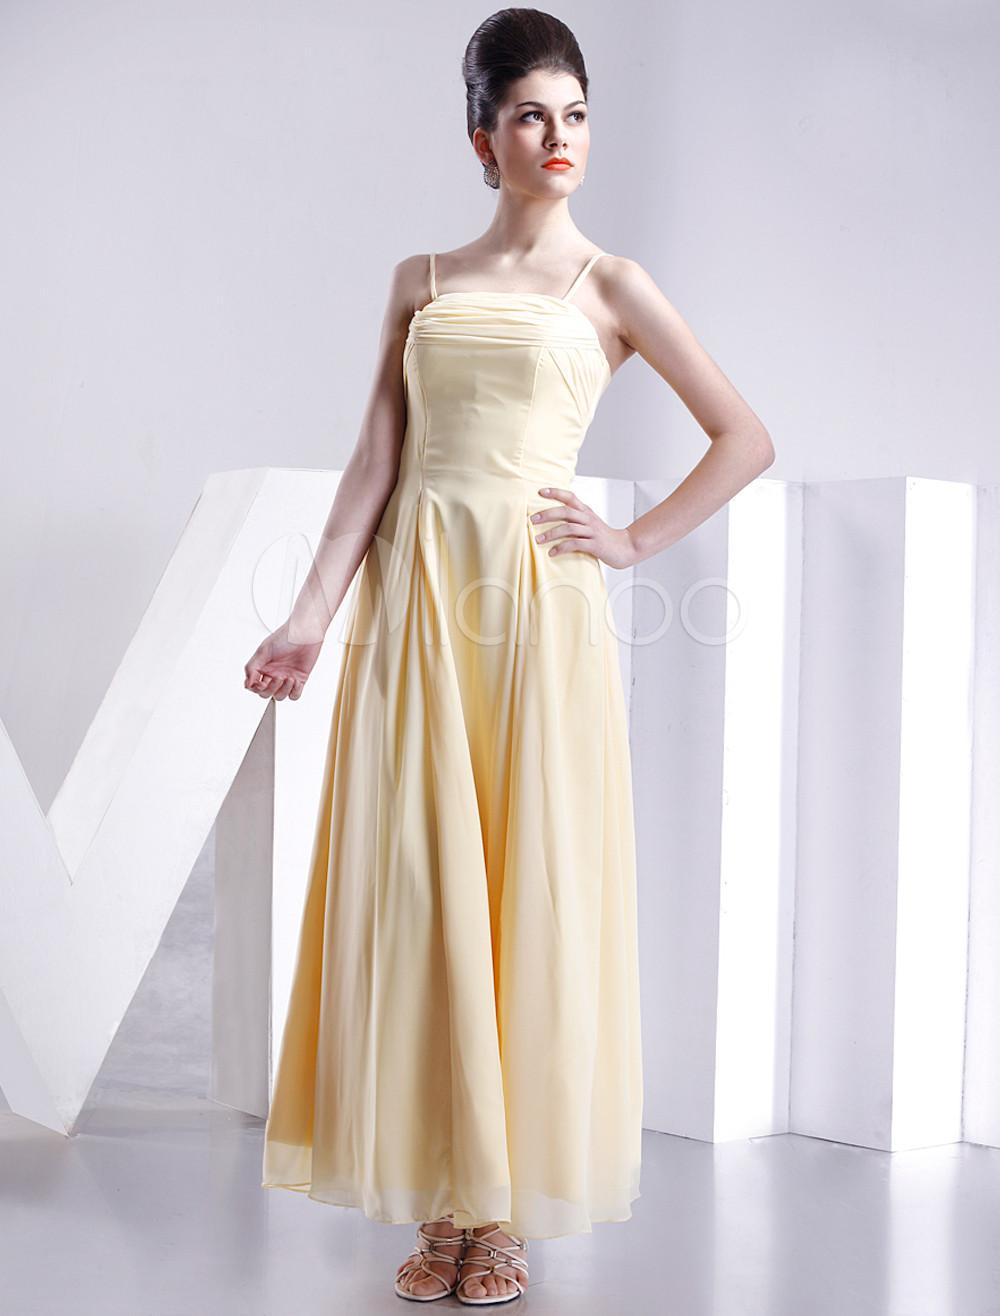 Sheath Spaghetti Straps Daffodil Satin Bridesmaid Dress